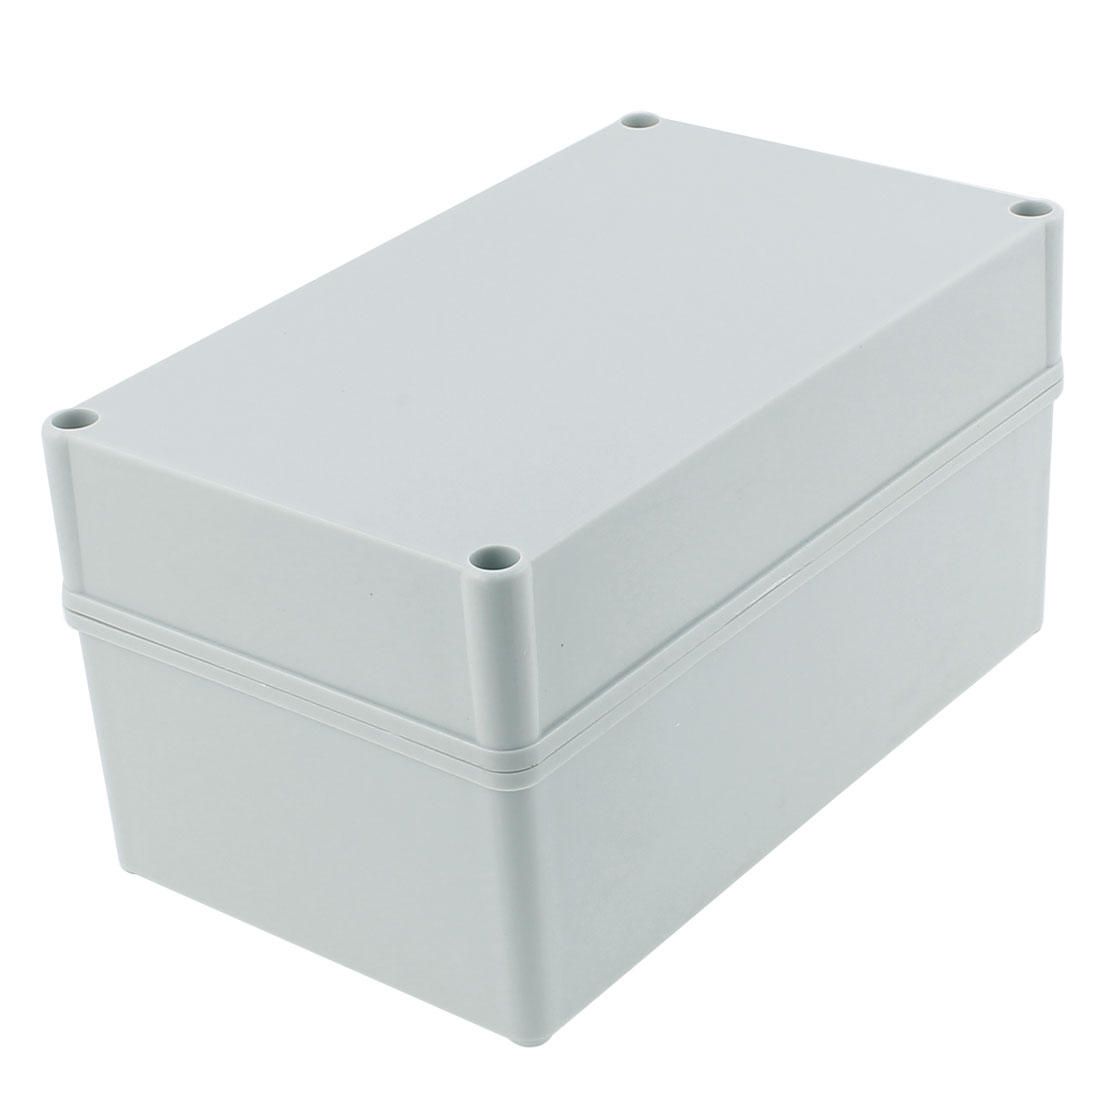 250 x 150 x 130mm Dustproof IP65 Junction Box Terminal Connection Box Enclosure